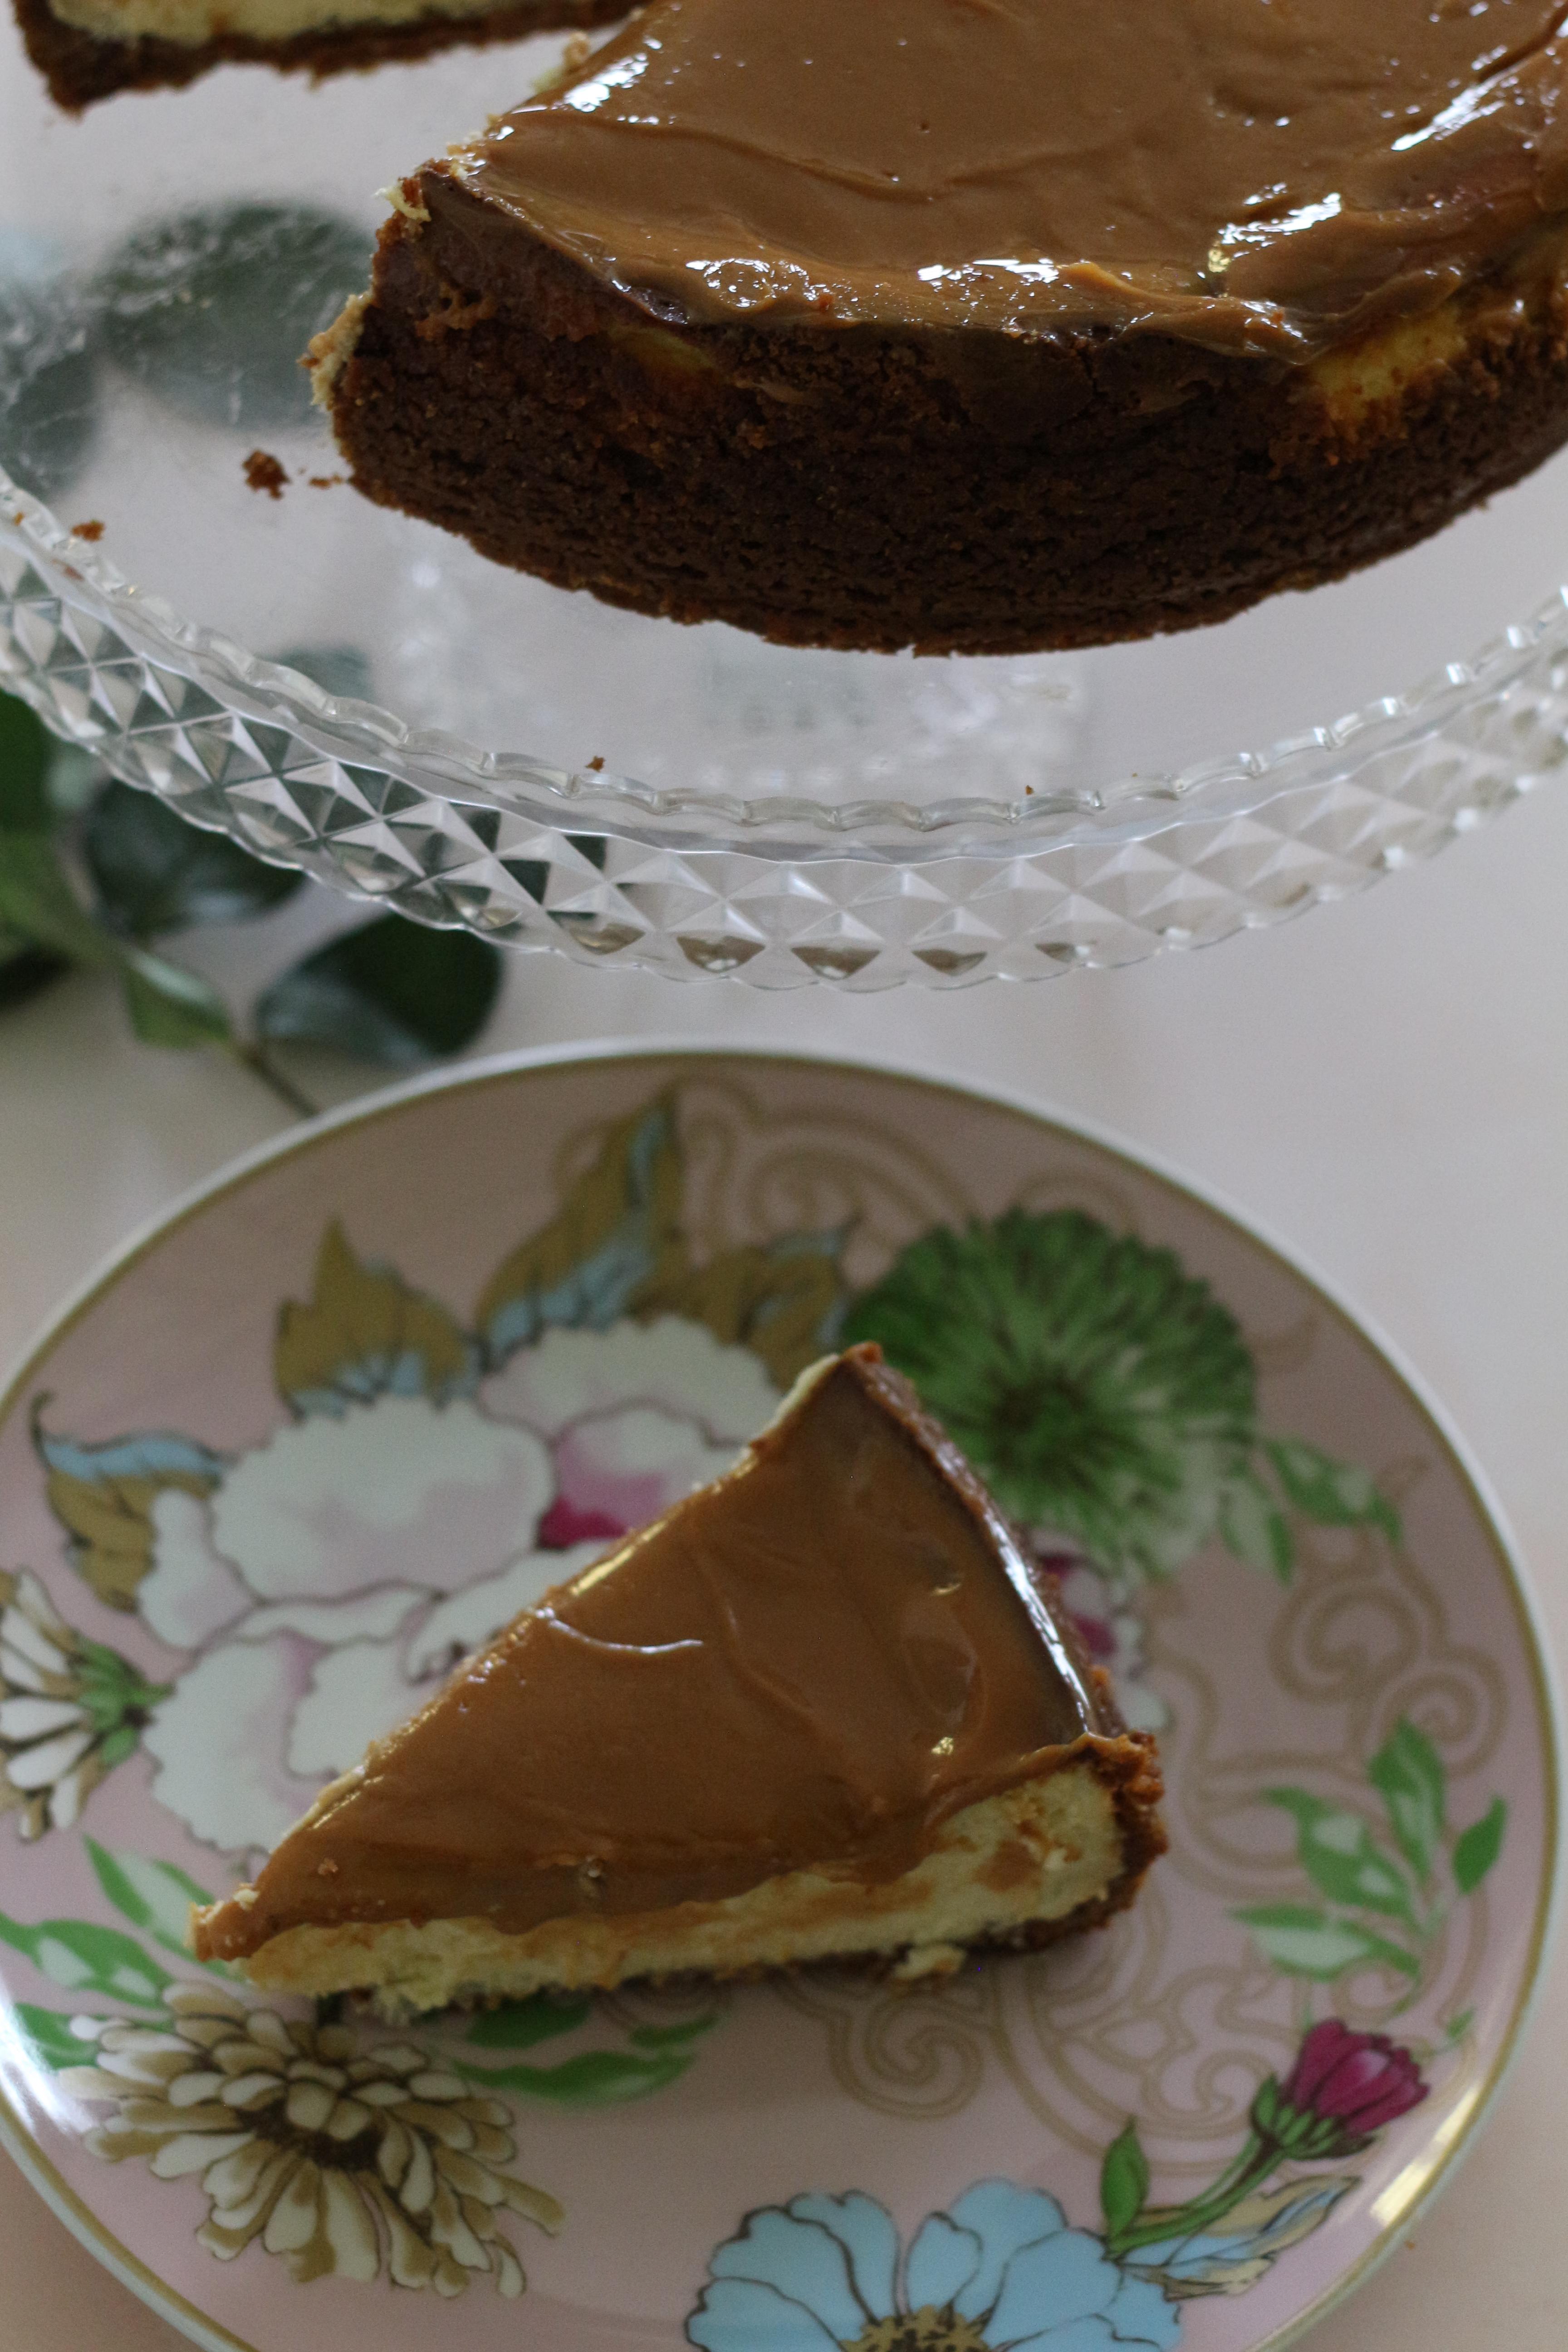 caramel baked cheesecake